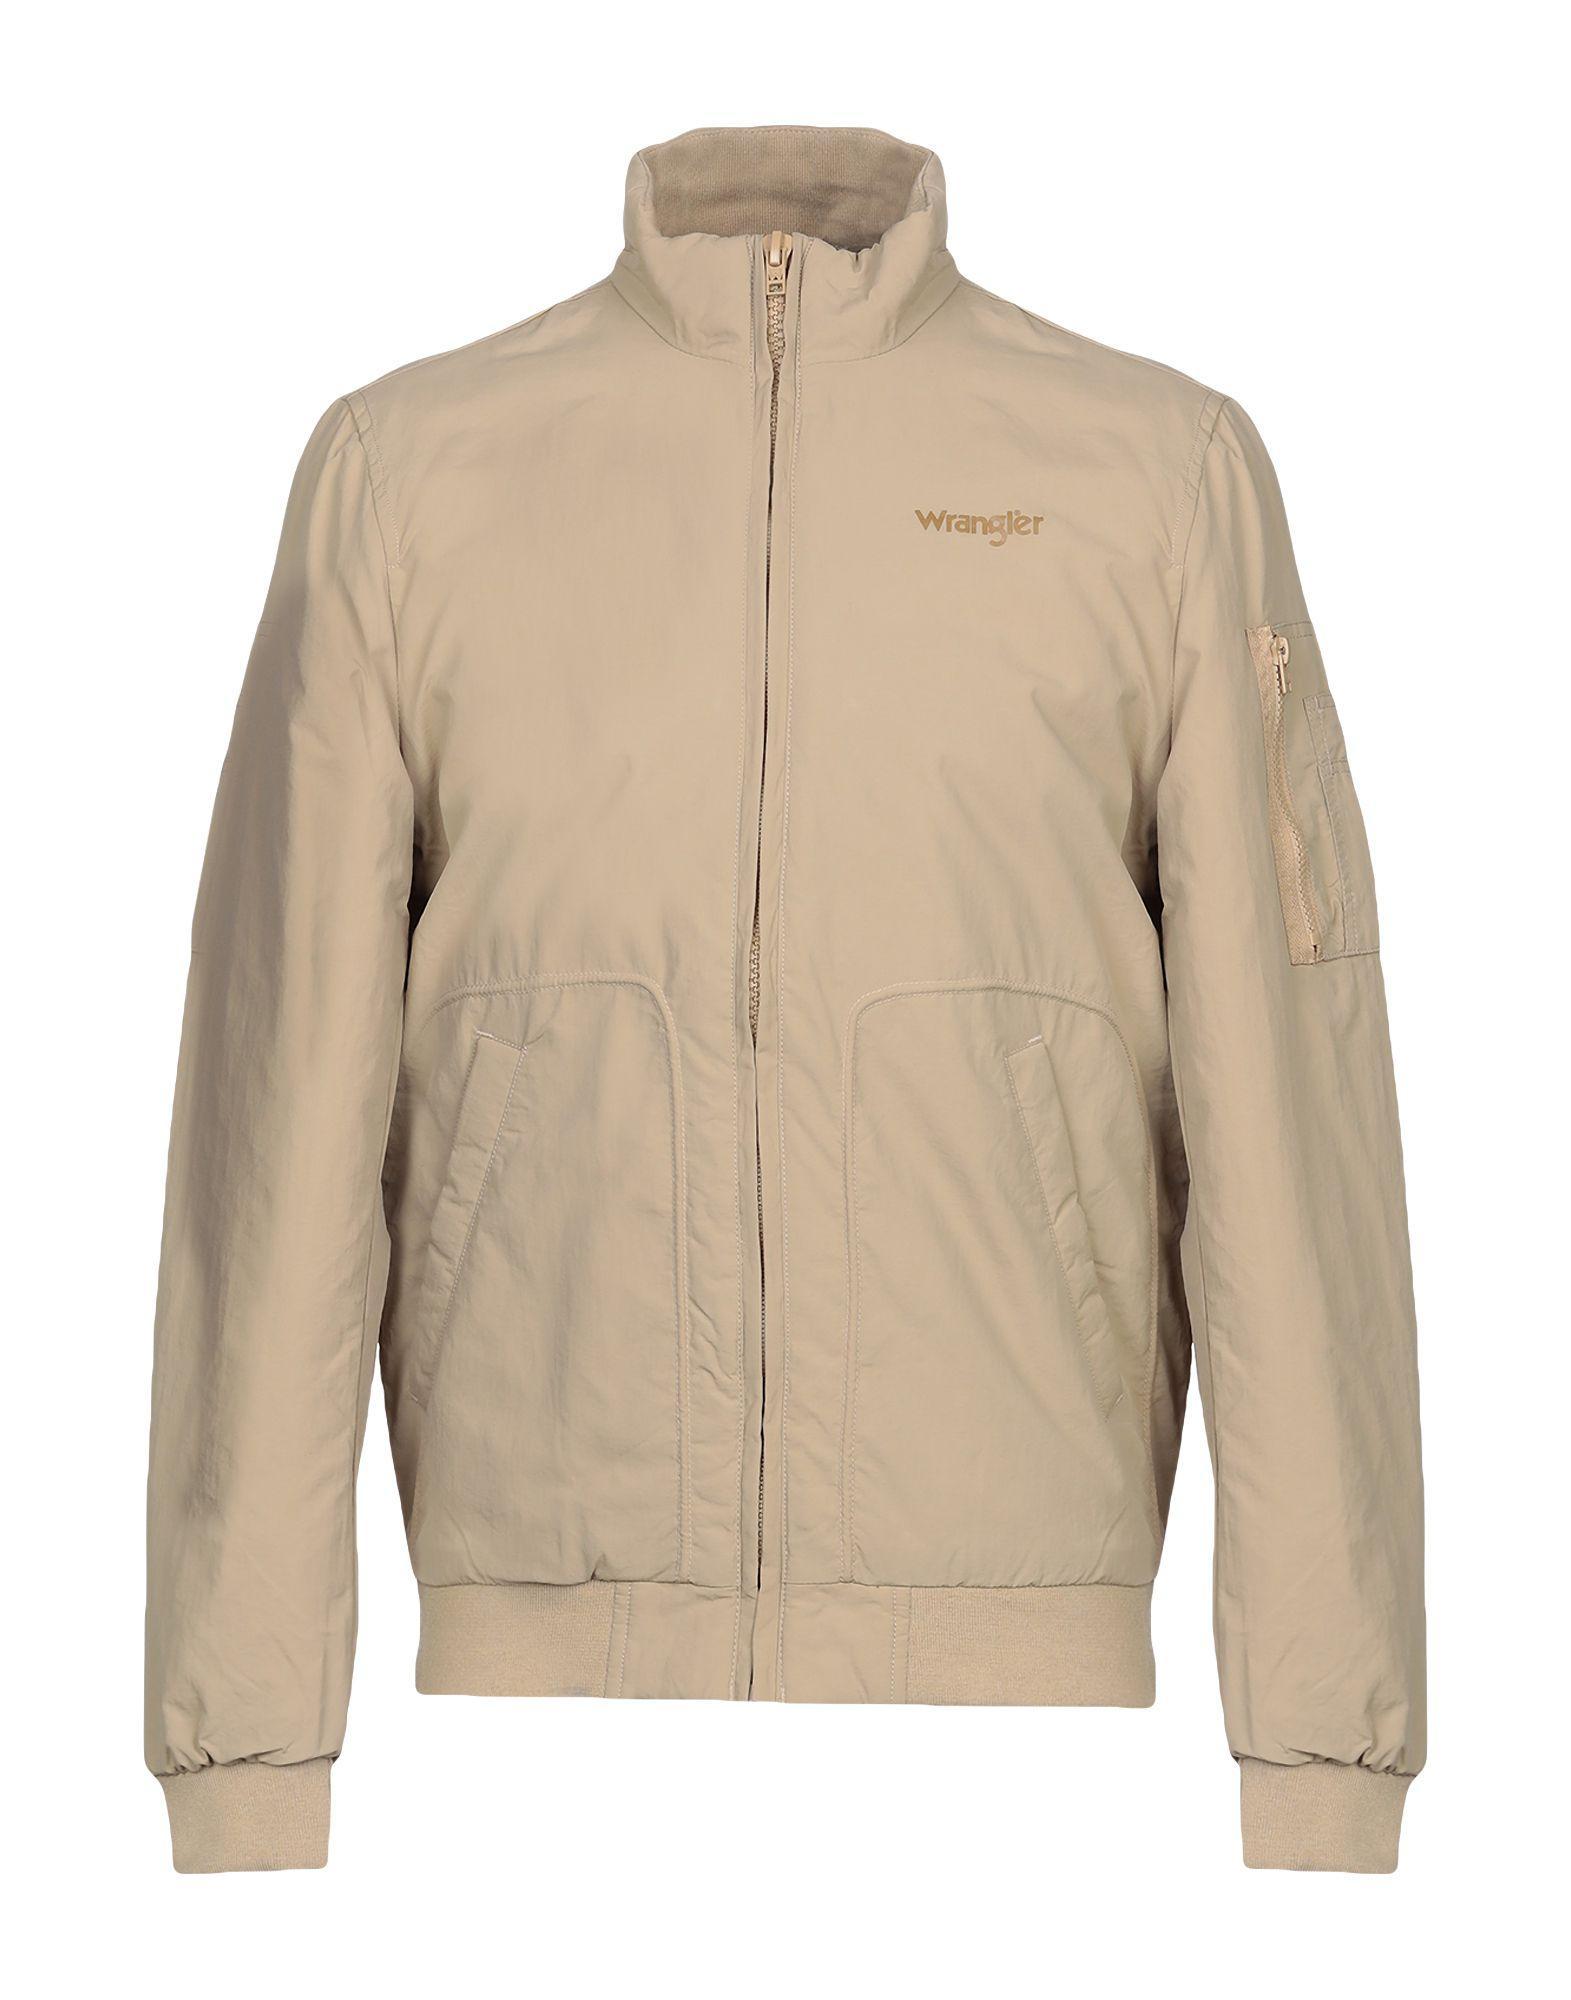 8f4dd1e11a19 Lyst - Wrangler Jacket in Natural for Men